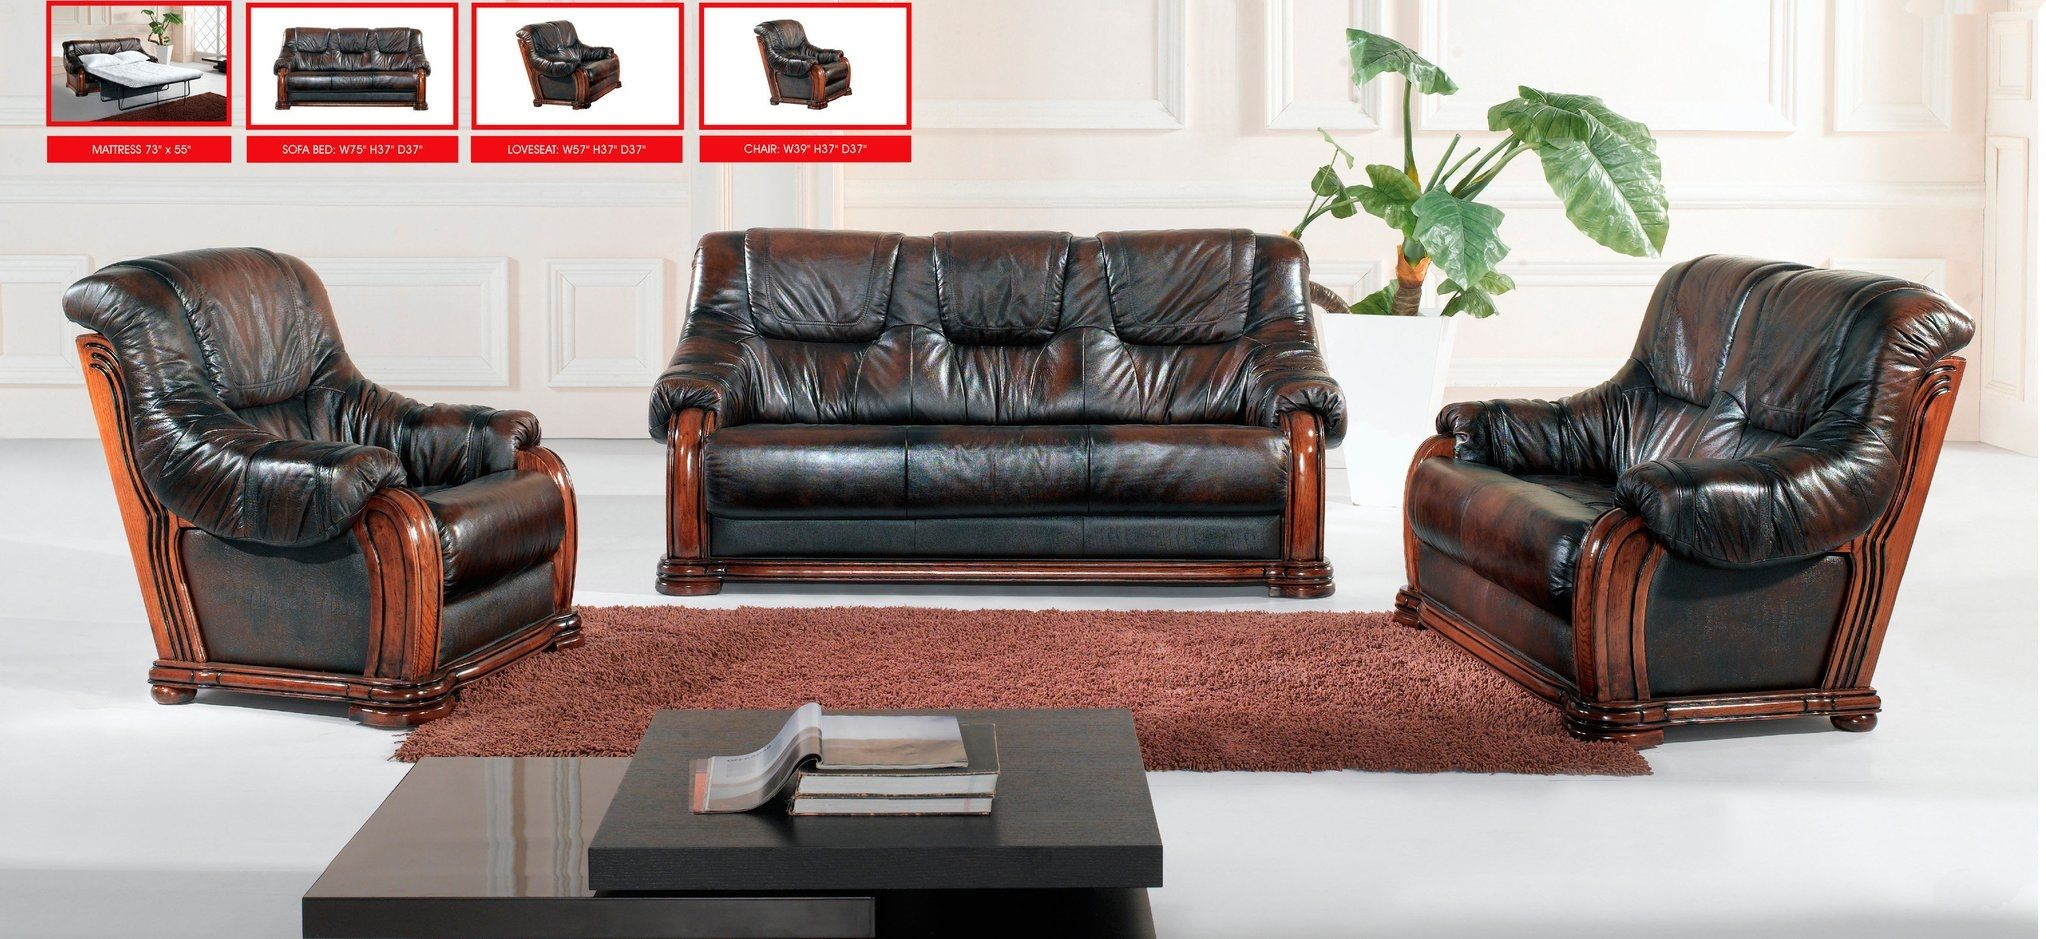 Leather Sofas With Wood Trim 3 Pc Ho11 S Genuine Leather W